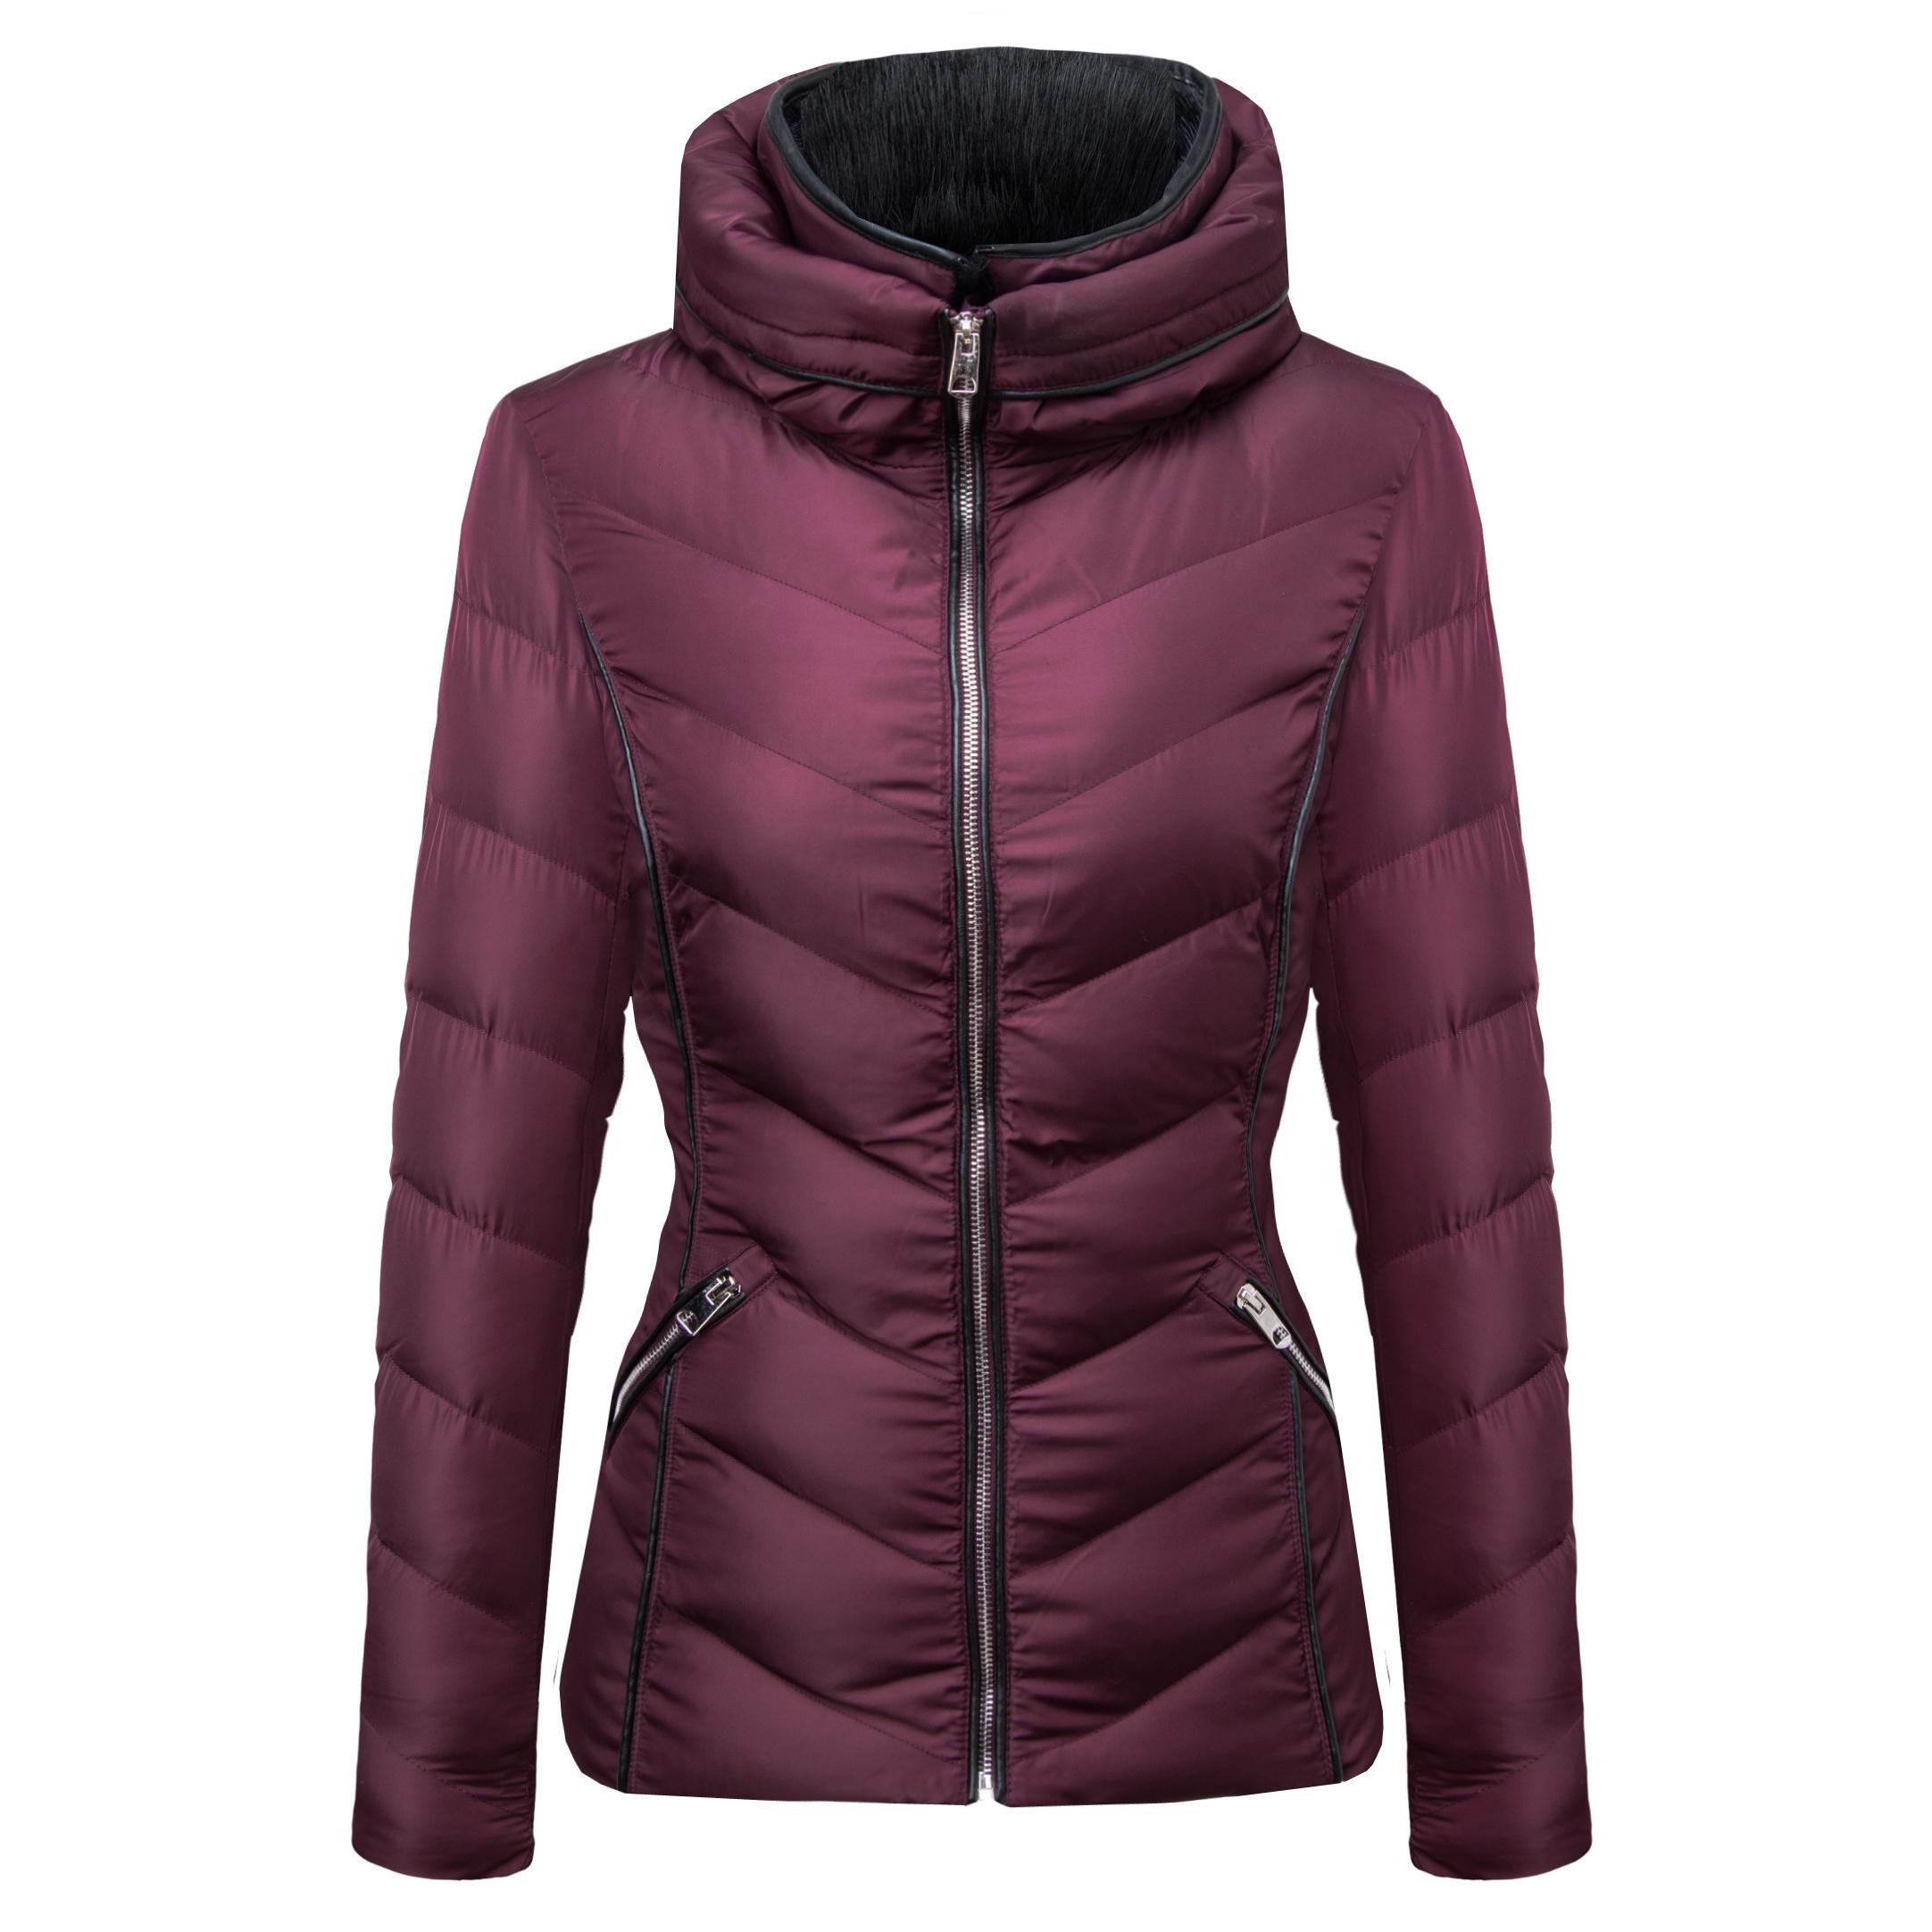 wholesale women s jackets coats fashion blazer winter clothes bomber jacket for women